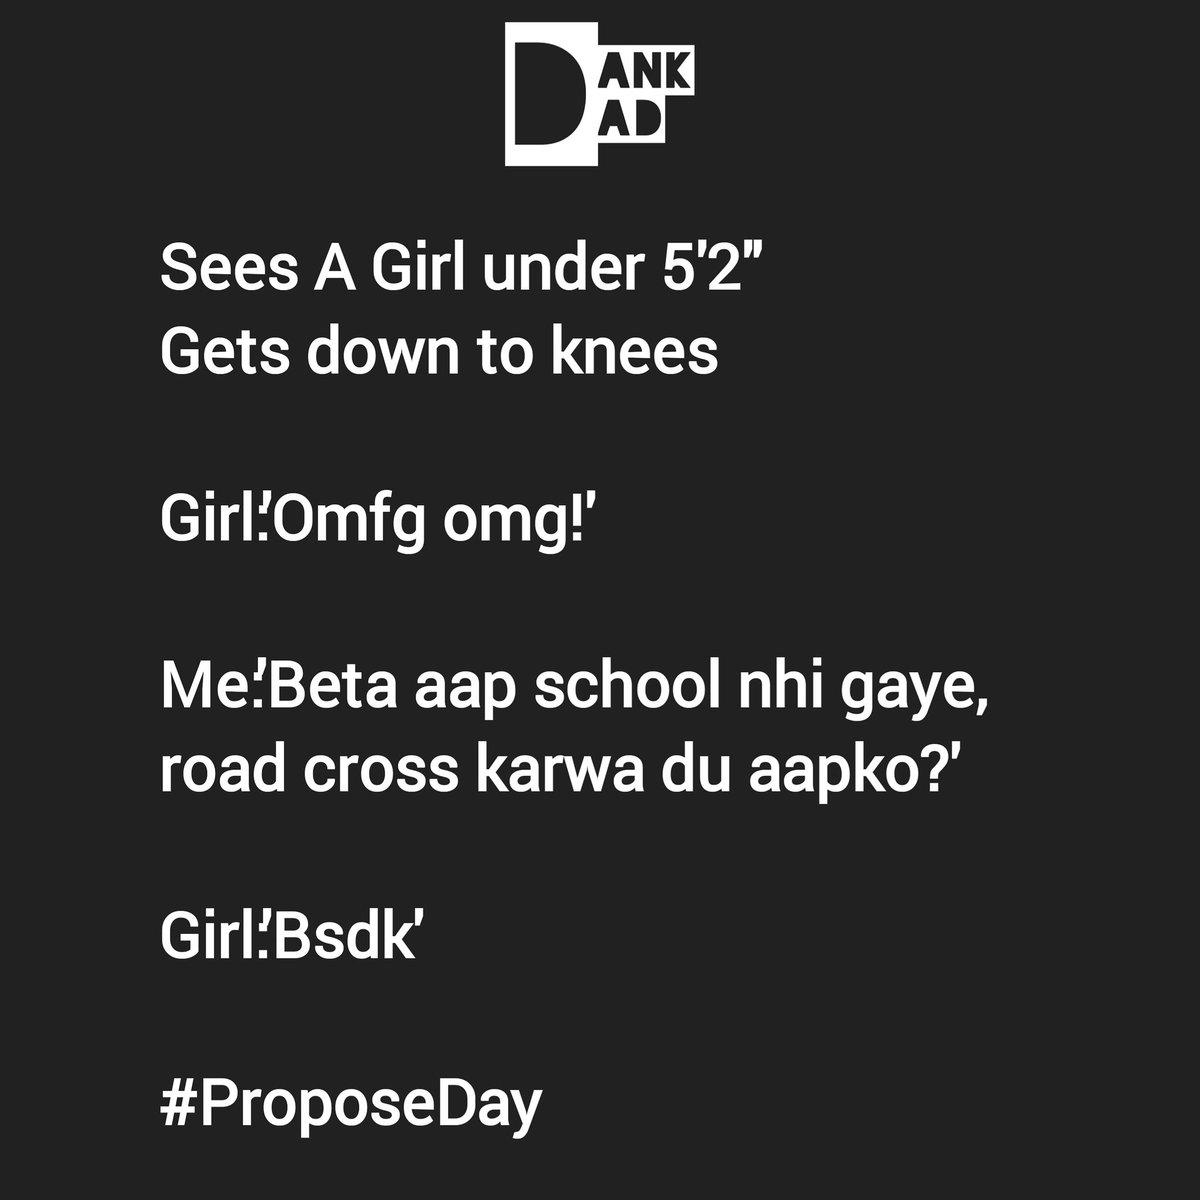 Follow @_dank_dad_ for more ....#fun #jokeoftheday #laugh  #dankjokes #nonvegjokes #follow #funny #jokes #sarcasm #FF #likes #comedyindia #backchodi #sacredmemes #bollywoodpic.twitter.com/ng6Dqx5oMf